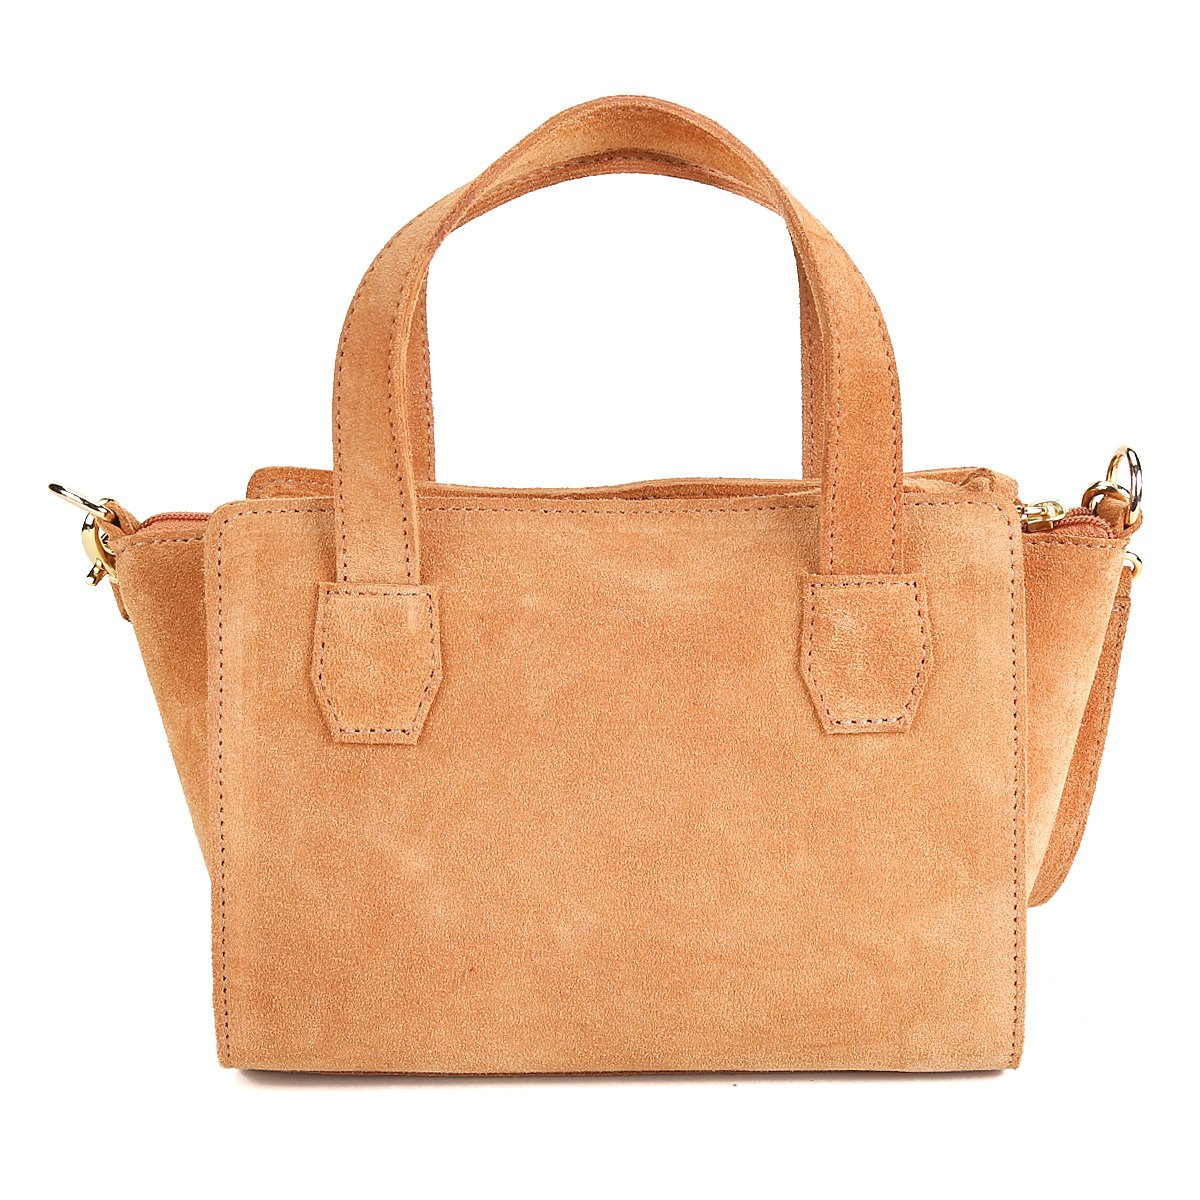 Caramelo Bolsa Camurça Bag Shoestock Bolsa Tiracolo Shoestock Mini Feminina x8OAw